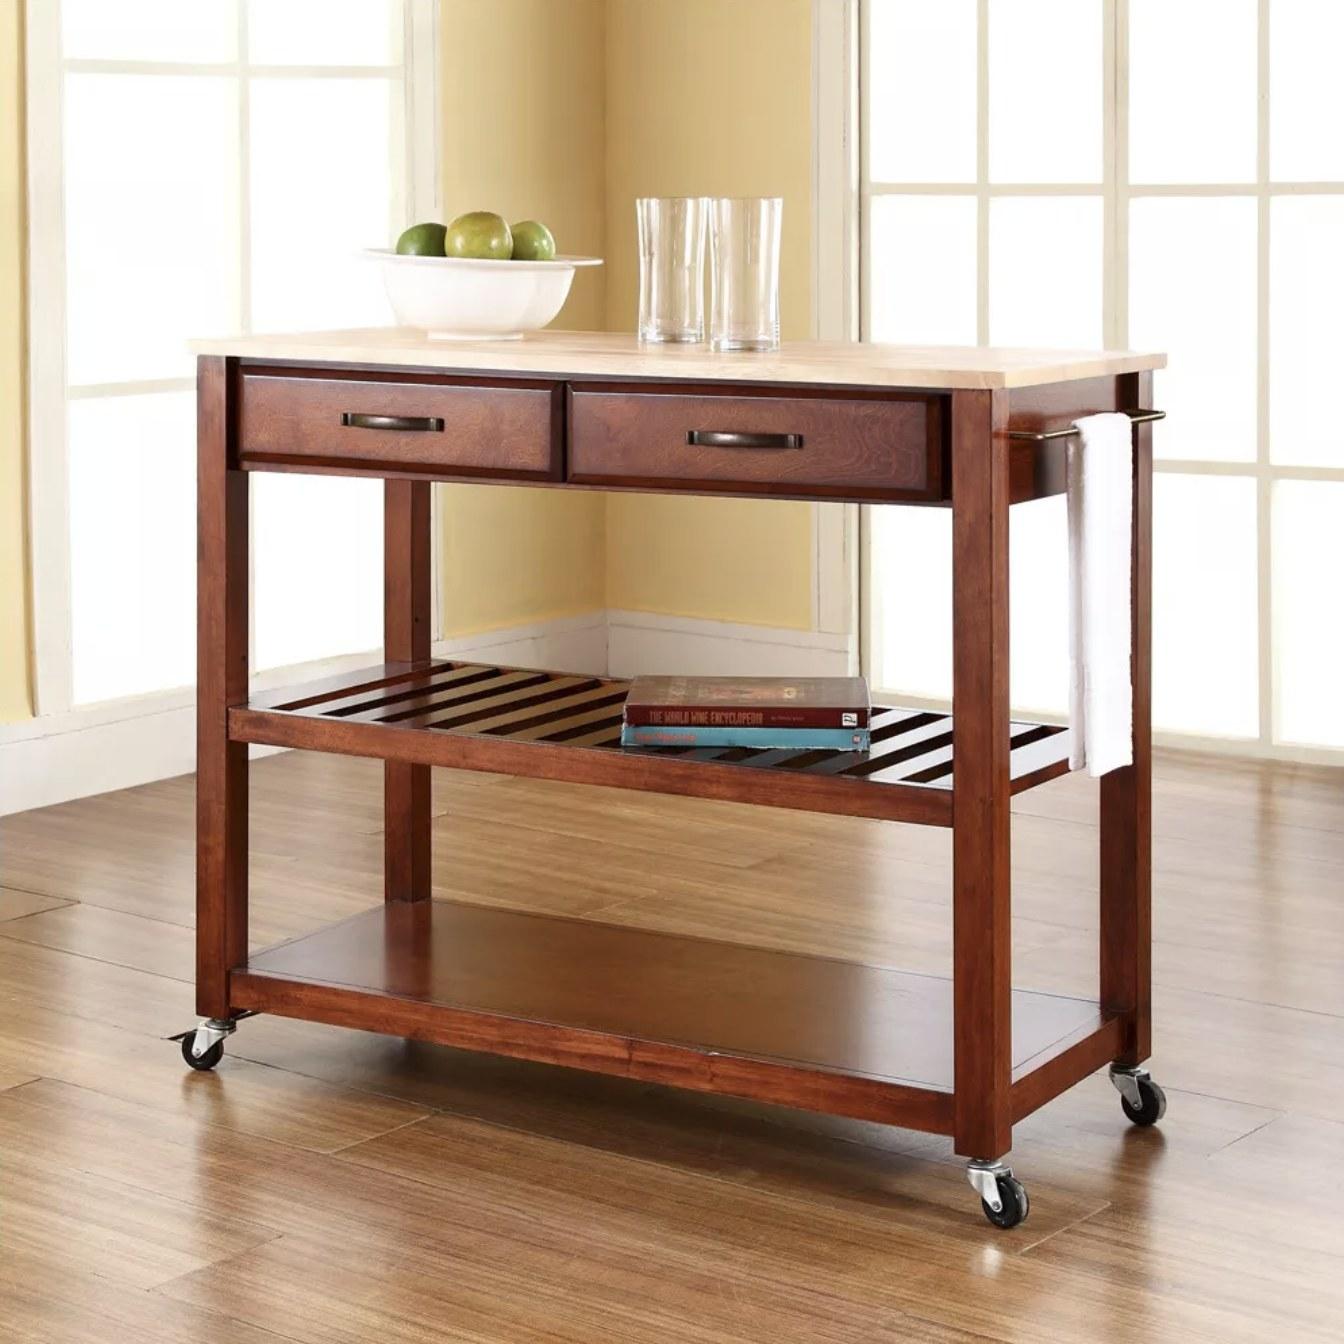 The cherry wood kitchen cart